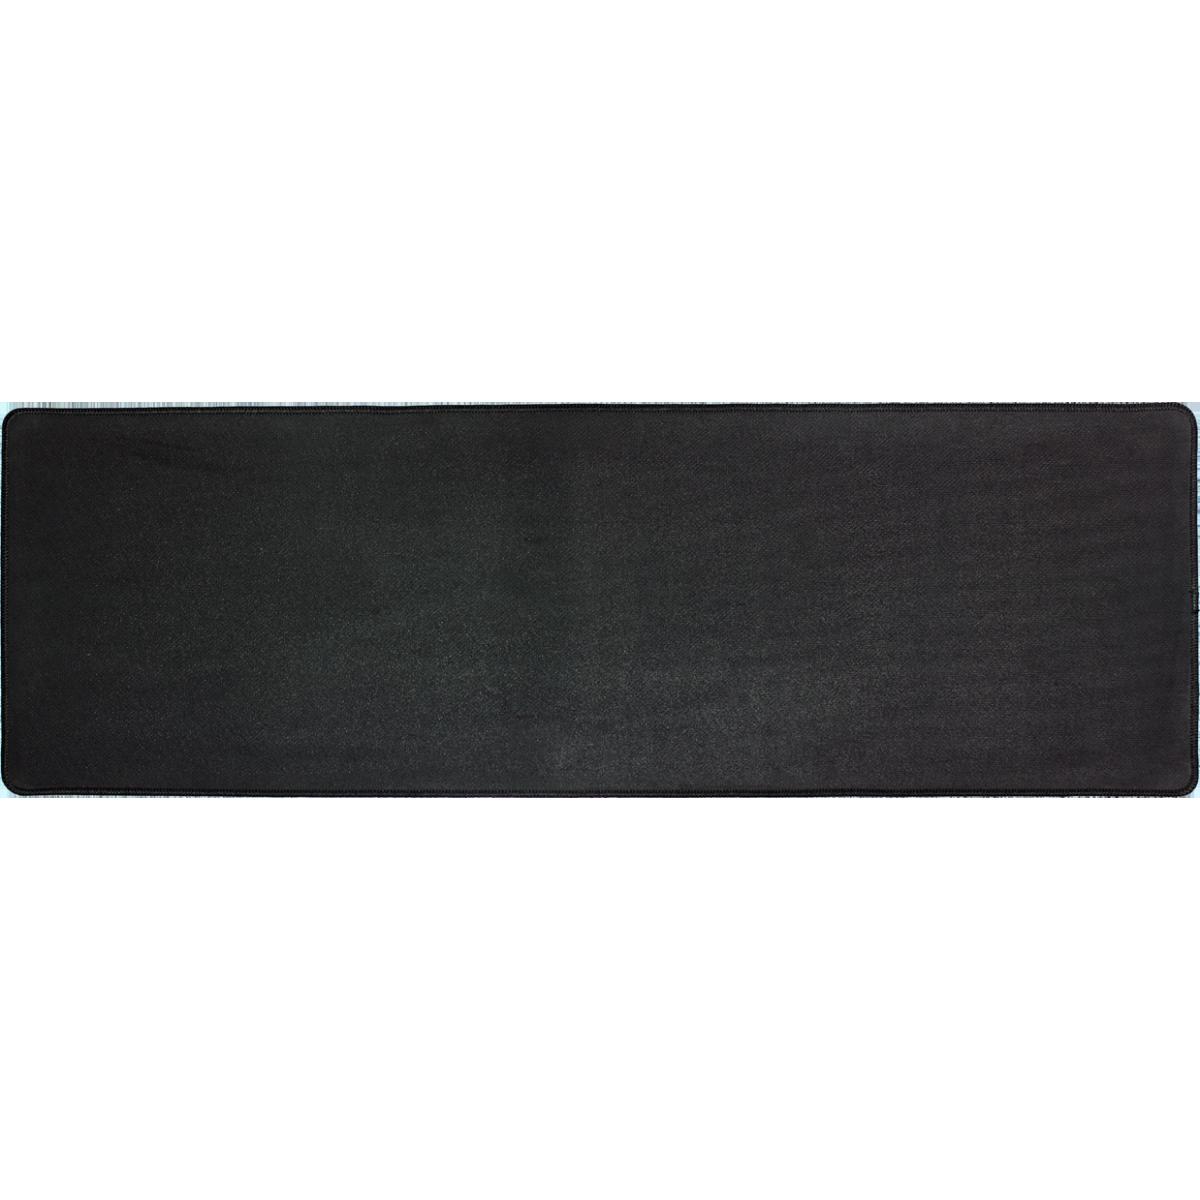 Mousepad Gamer Riotoro, Vyron Multi Bull Extended, Extra Grande, Black, MPAD-MB-L M